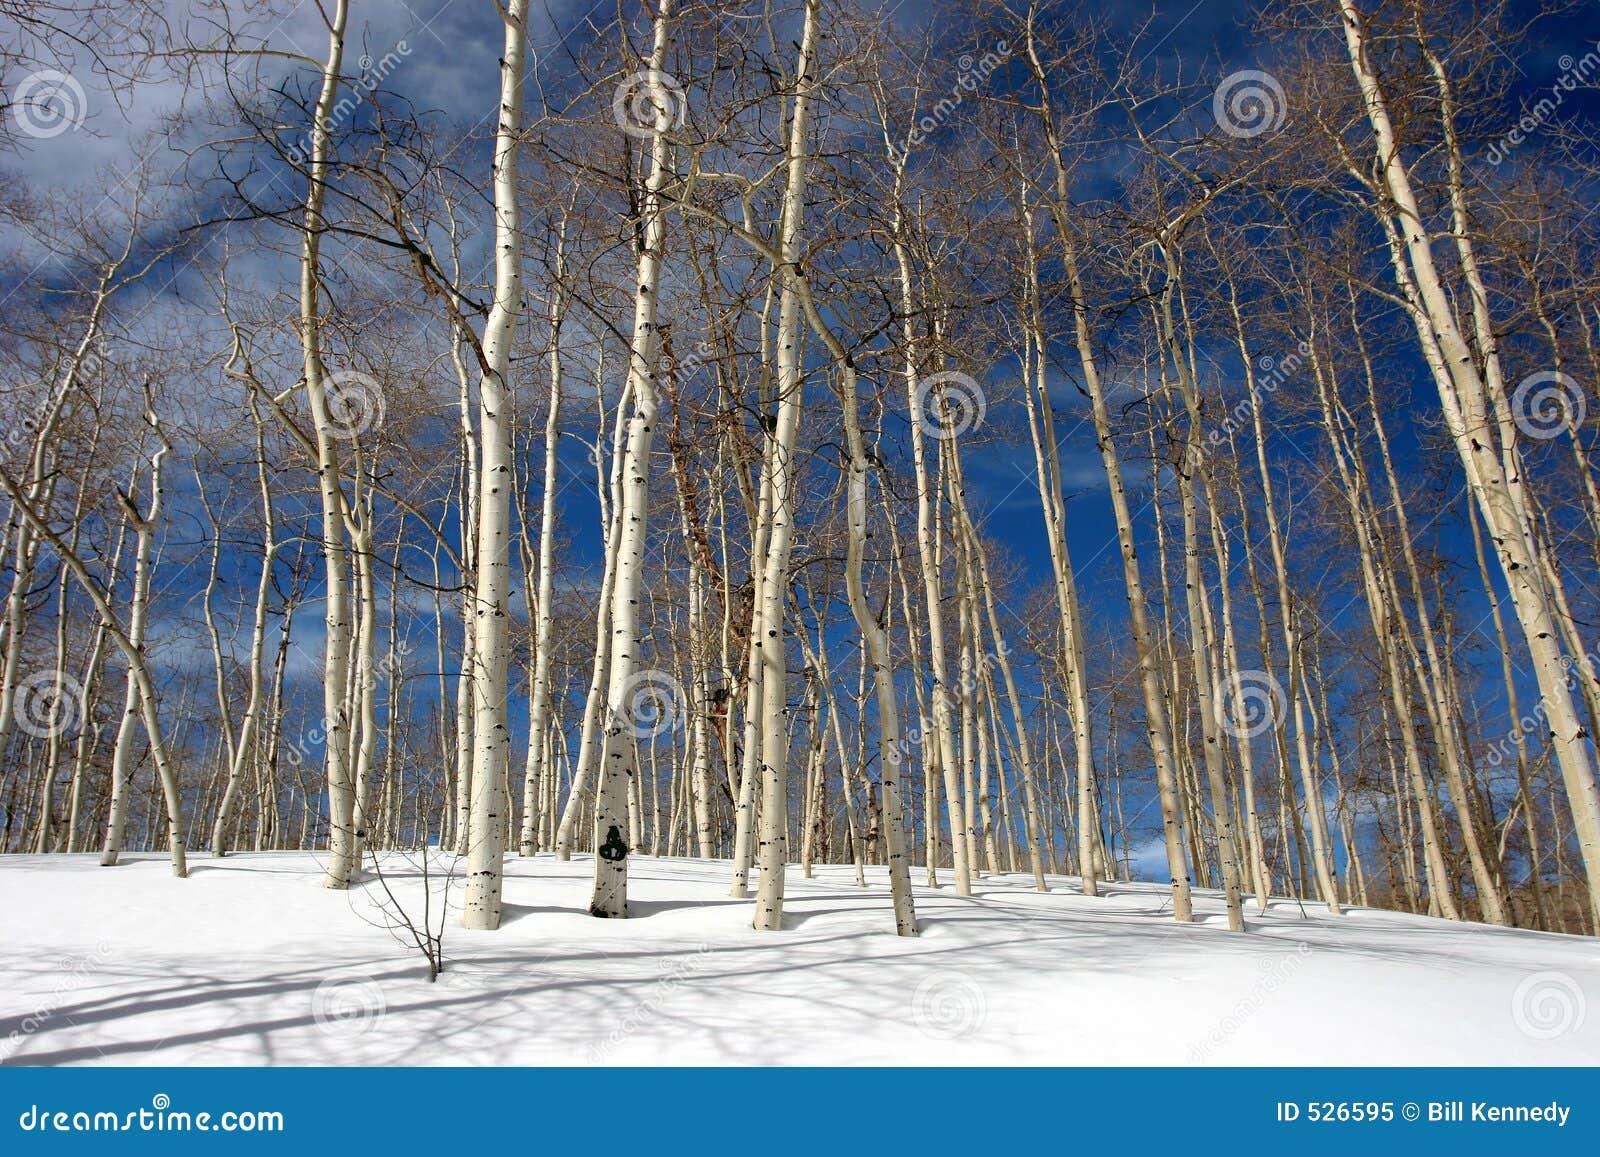 Birch trees in the winter stock photo image 2170700 - Snowy Aspen Trees Royalty Free Stock Photo